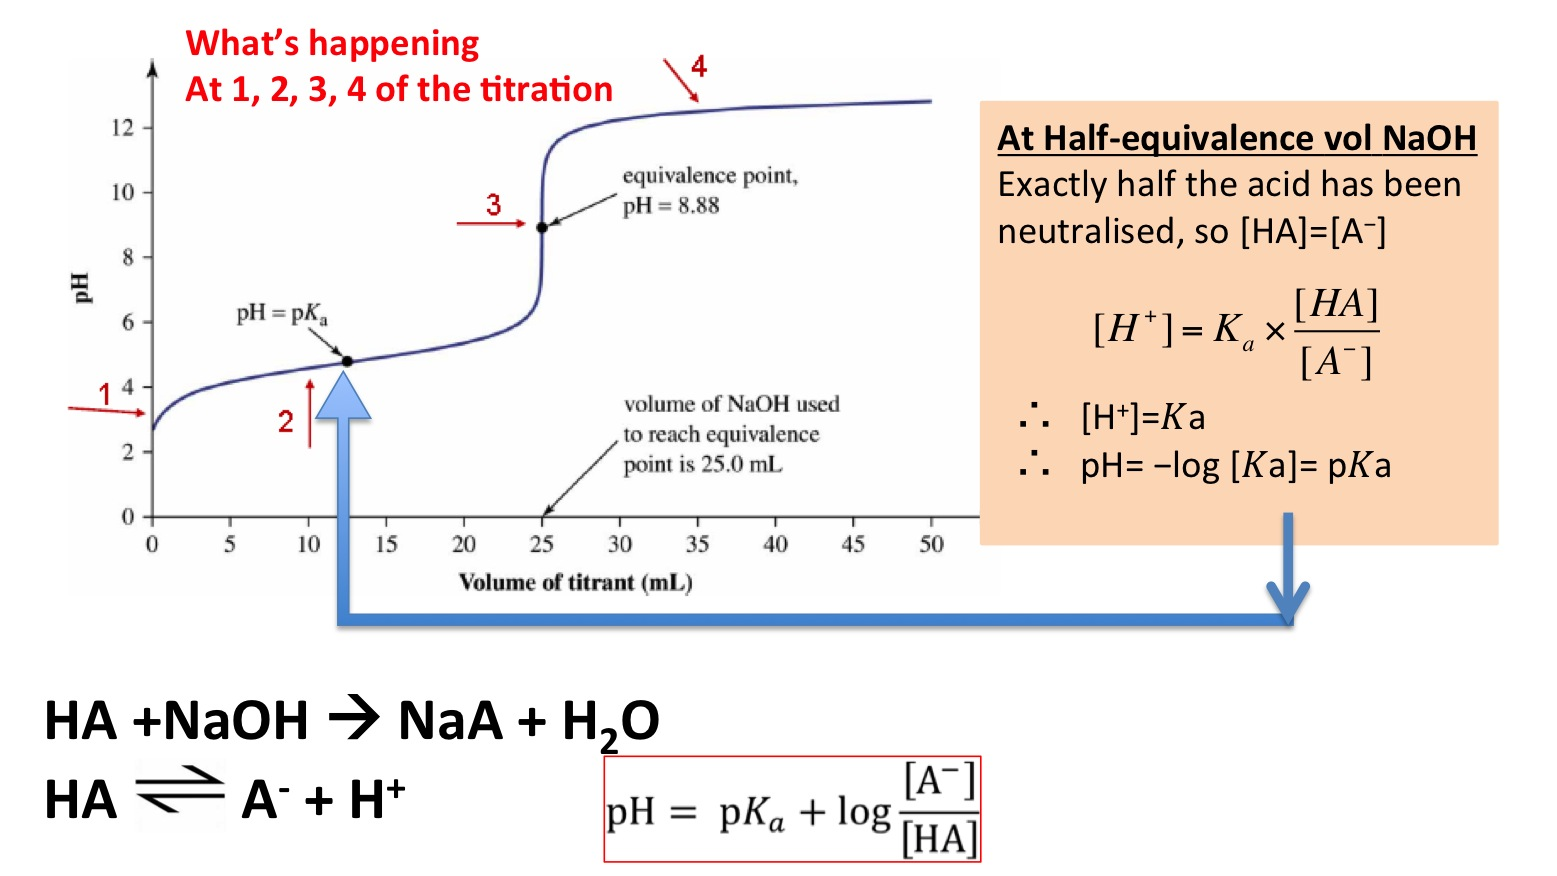 https://secondaryscience4all.wordpress.com/2014/08/10/ph-curves-titrations-and-indicators/